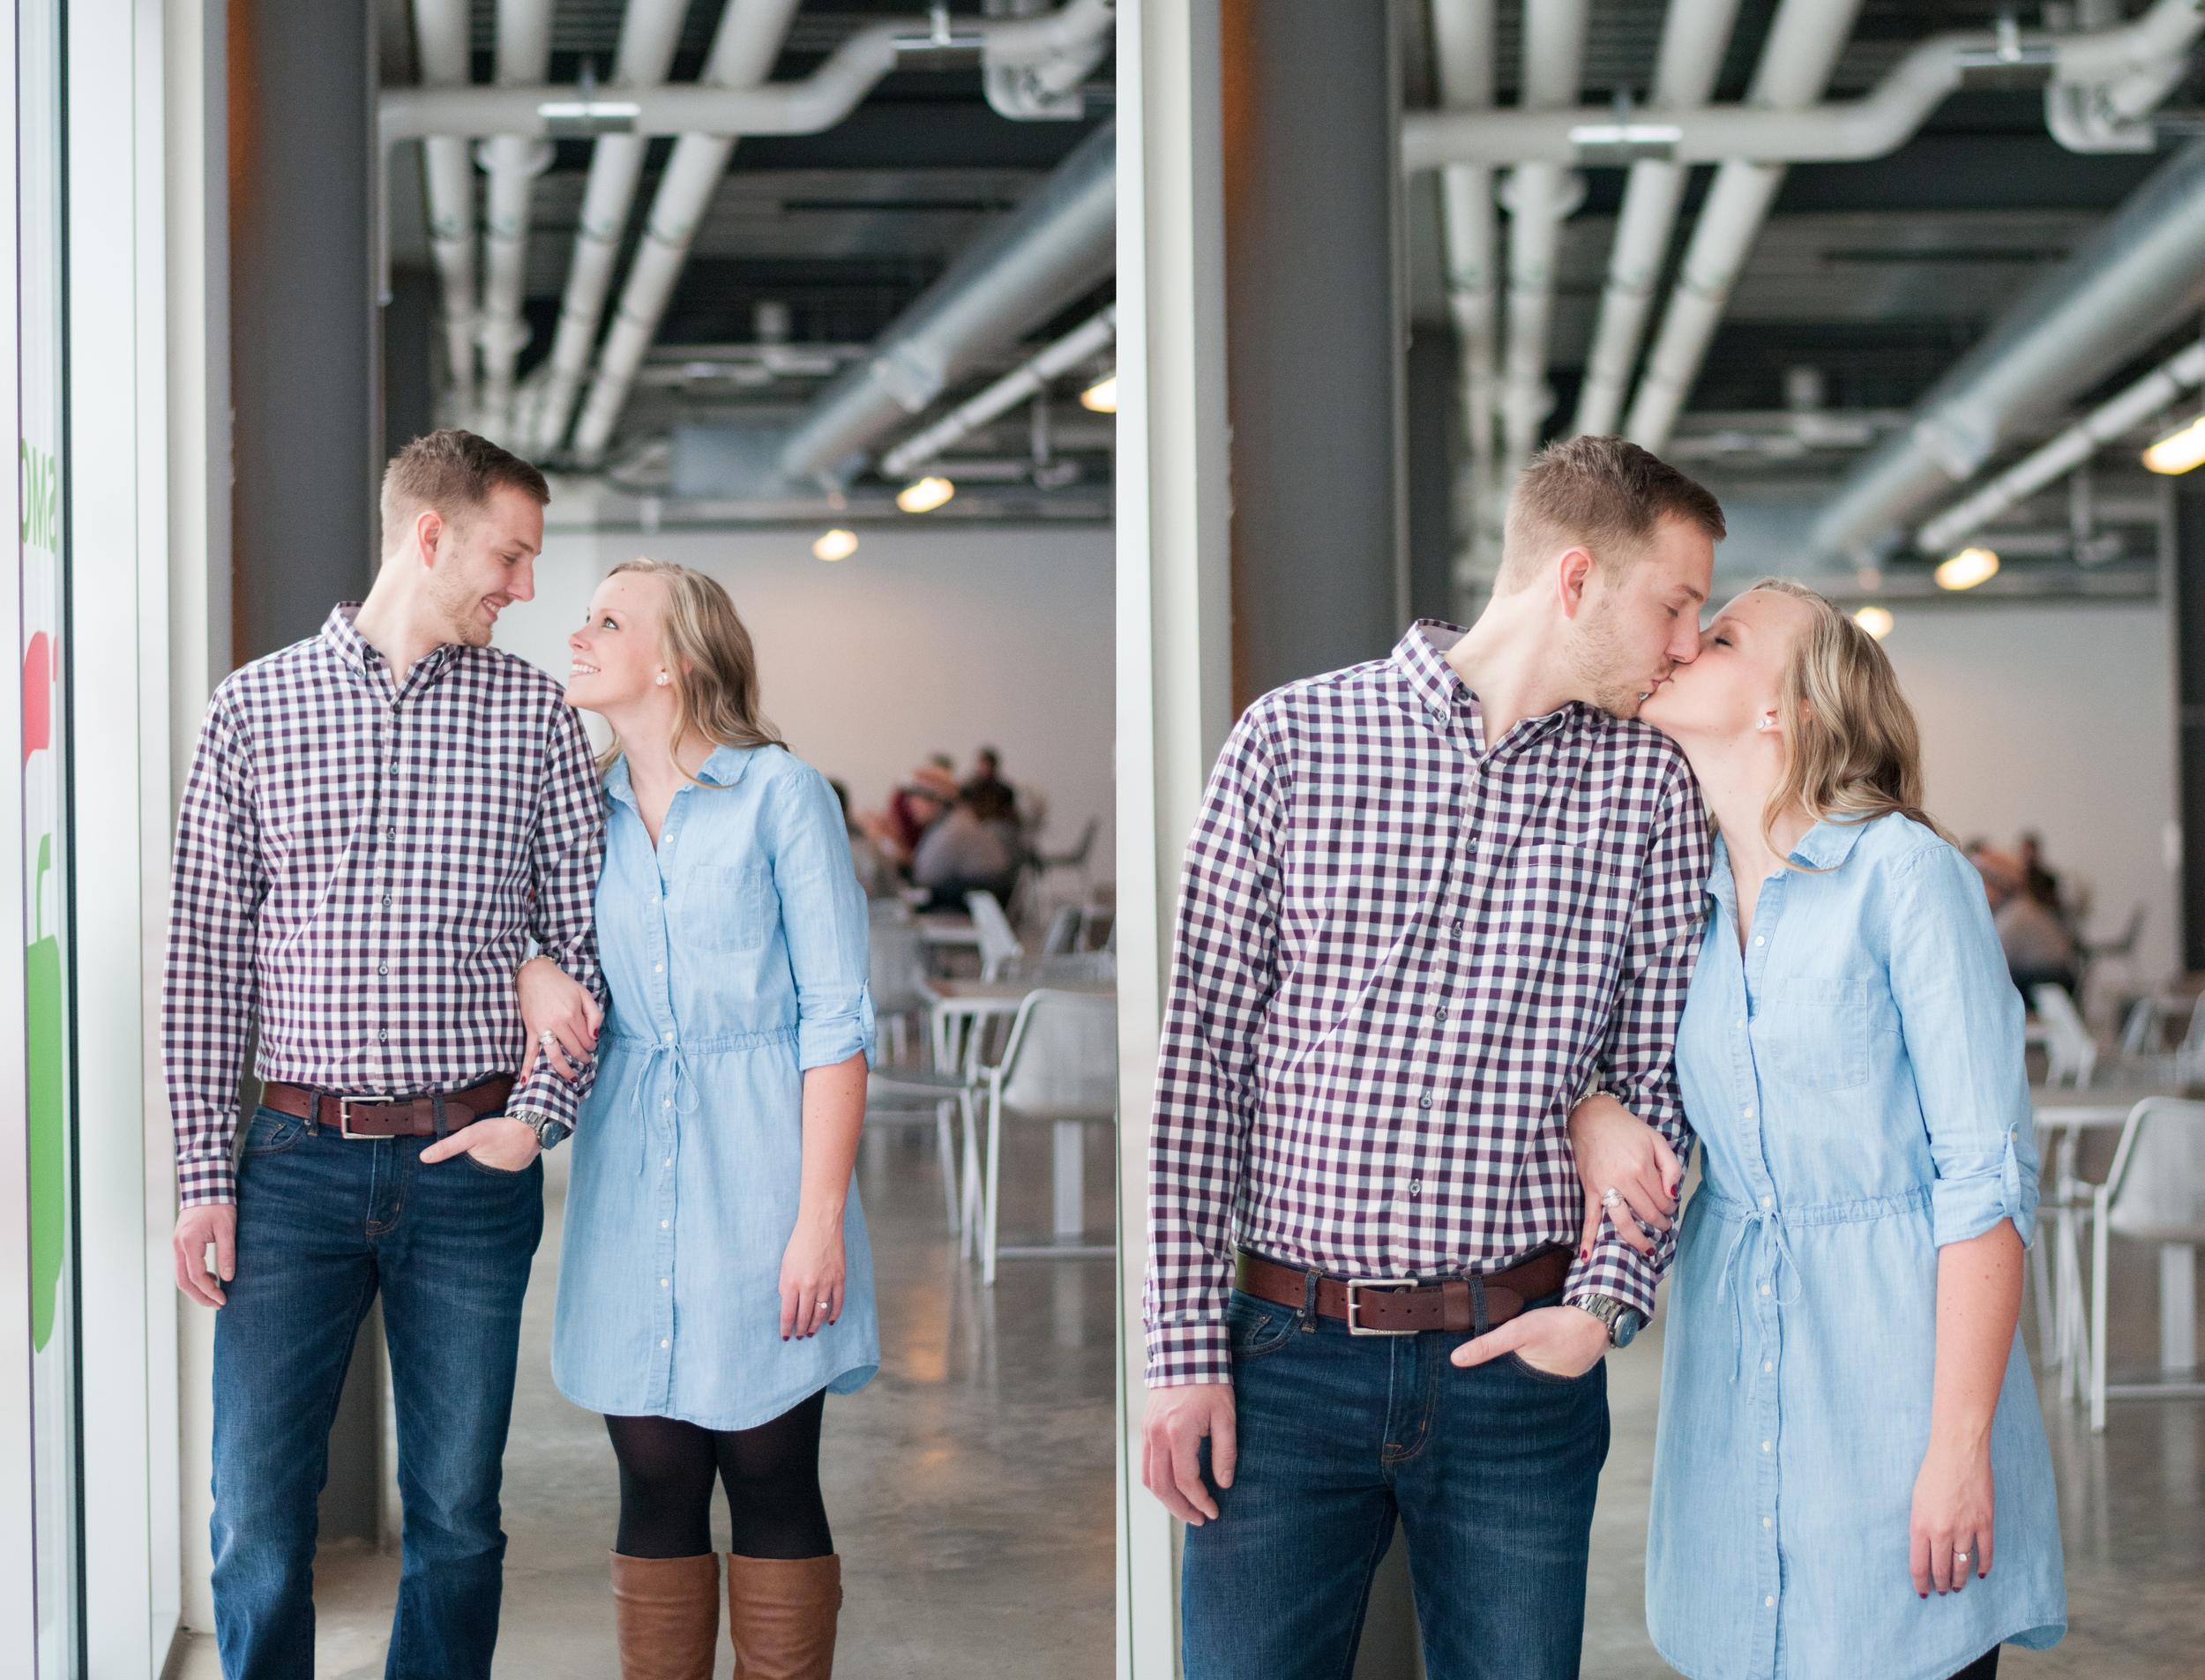 meredithdonnellyphotography-Engagement Kyleigh & Josh-29.jpg